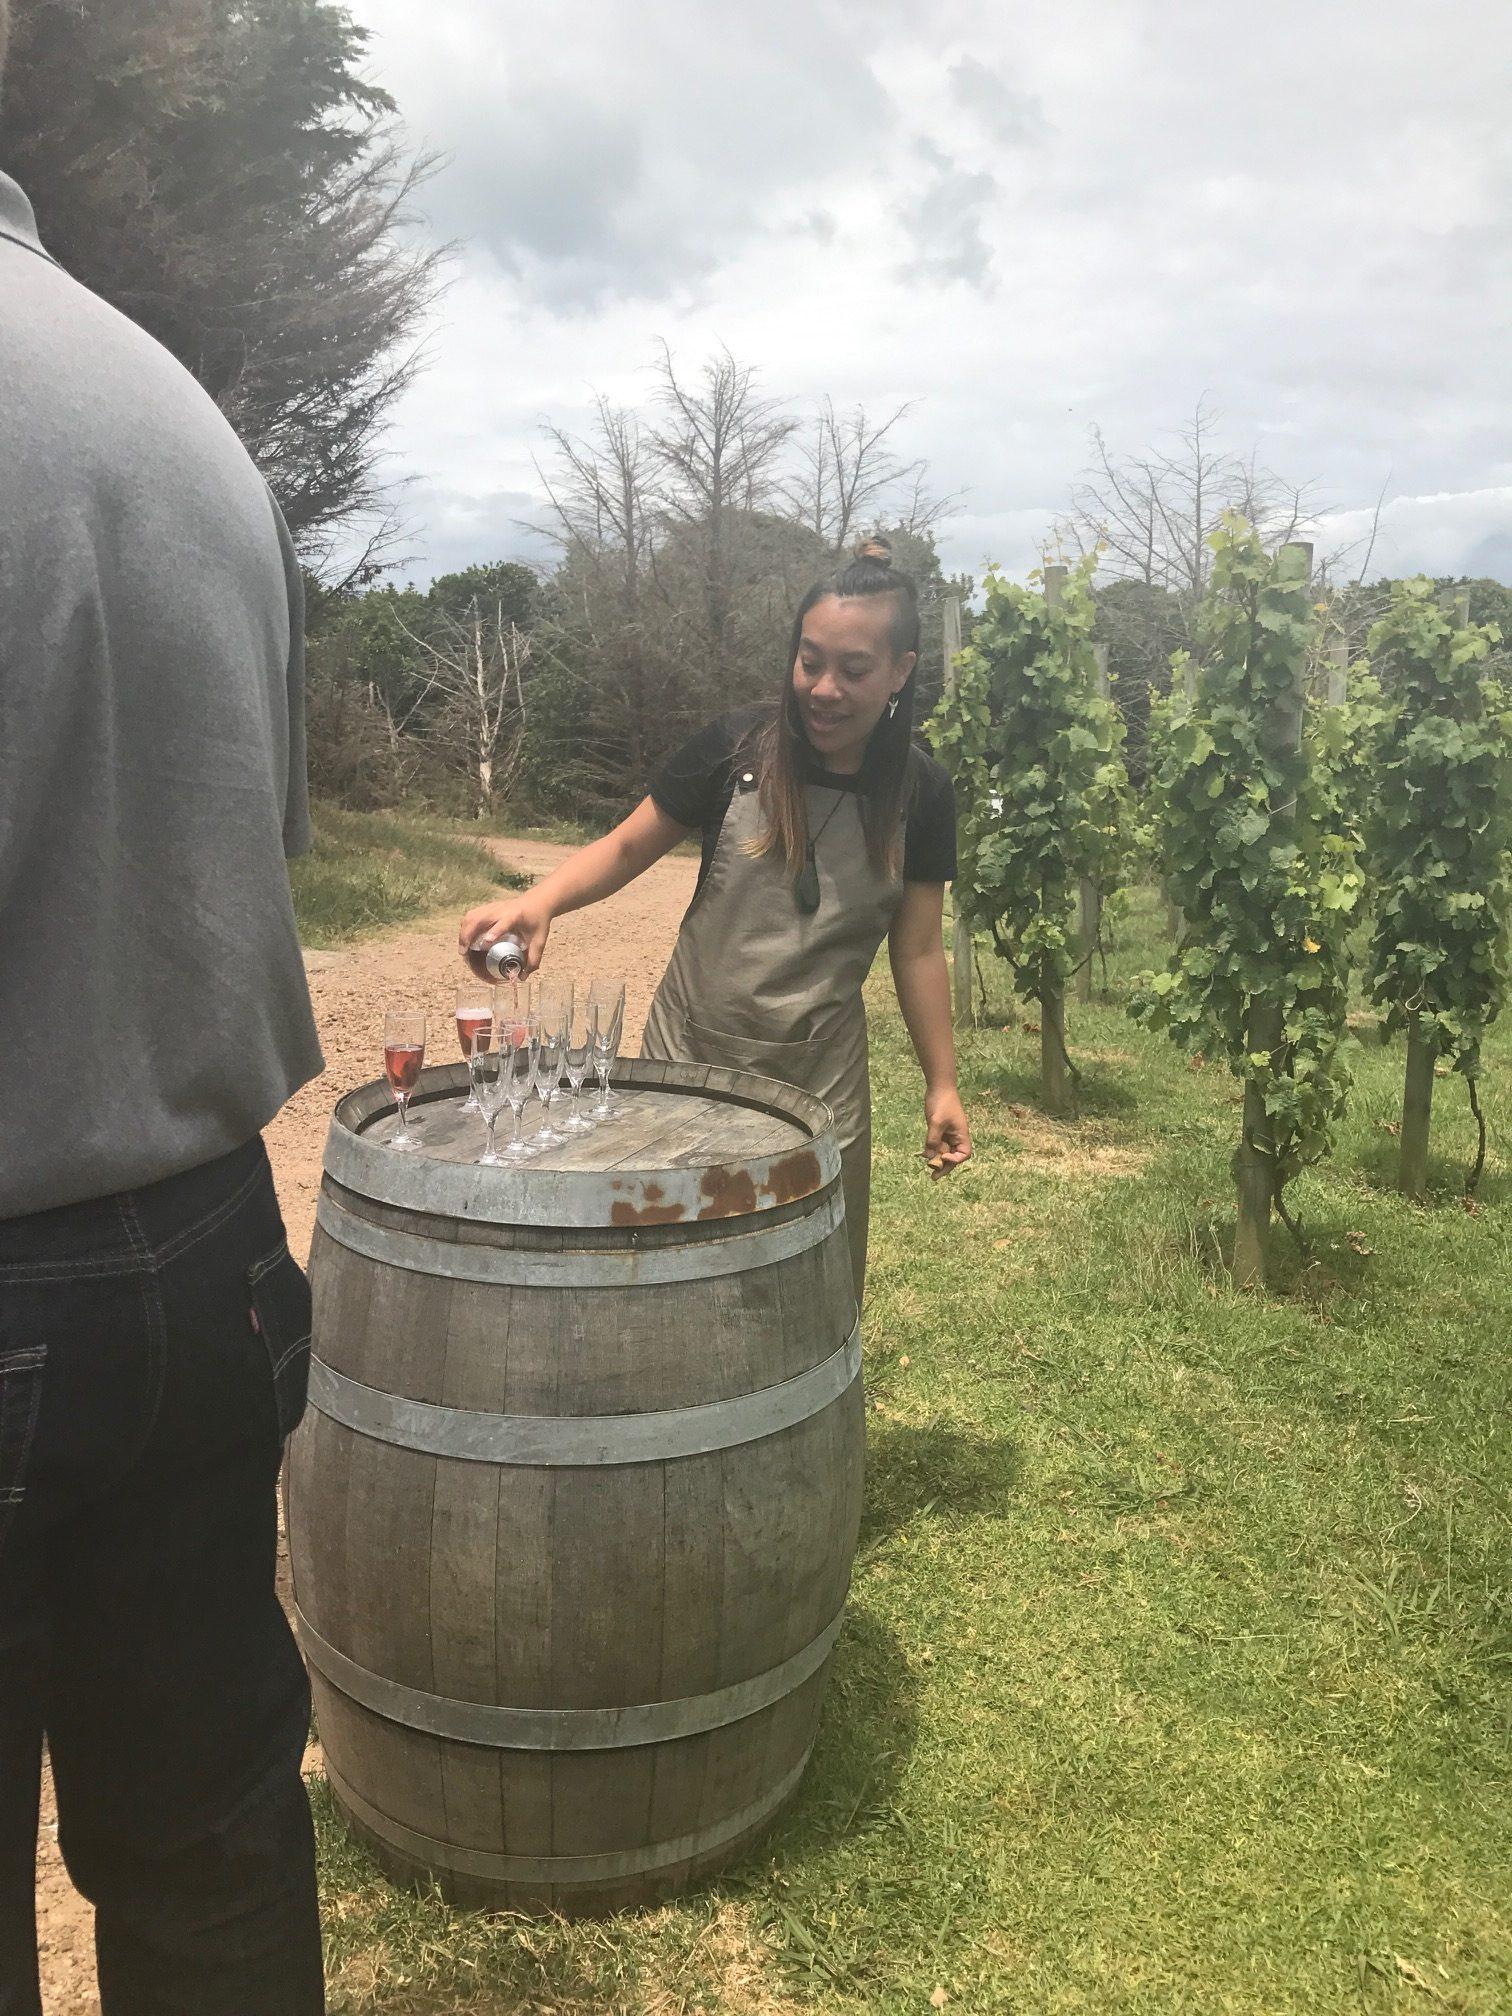 Wine tasting at Batch Vineyard